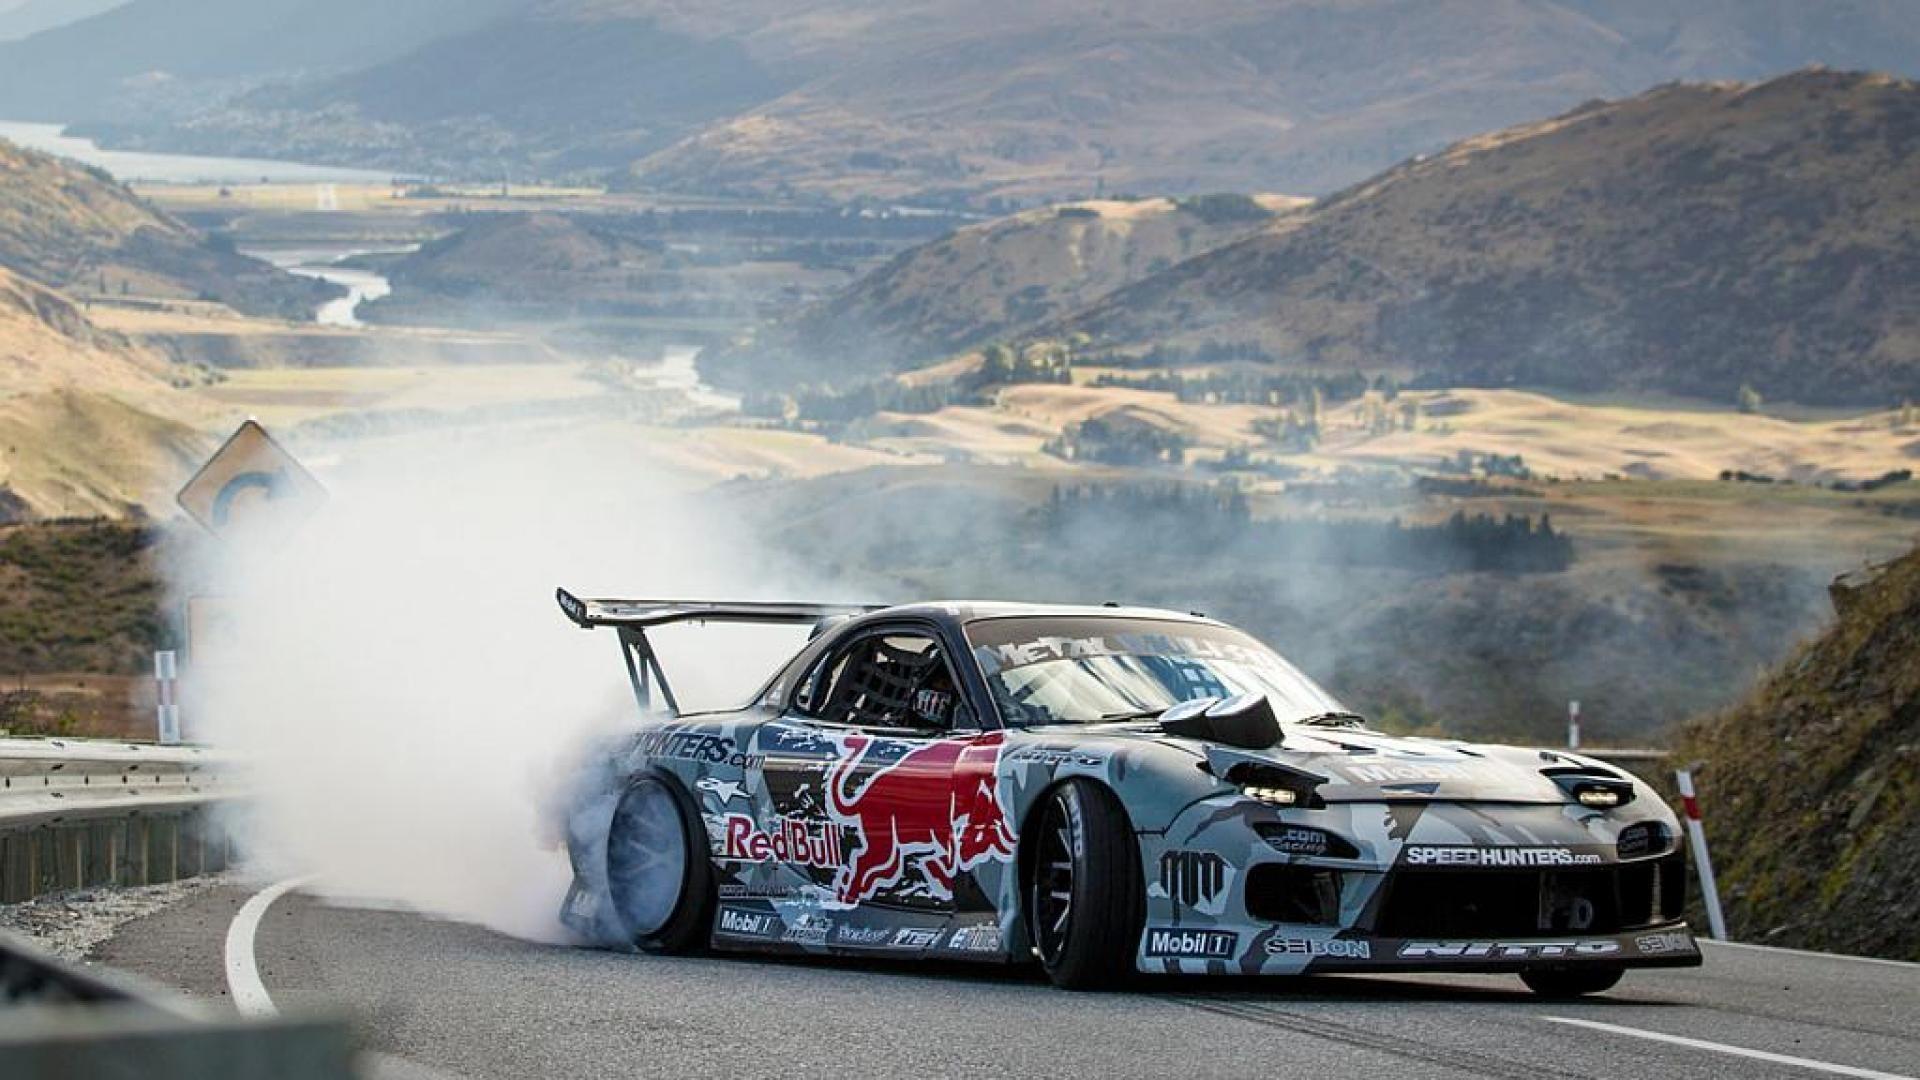 Cool Mazda Rx7 Drifting Hd Wallpaper Drifting Cars Mazda Rx7